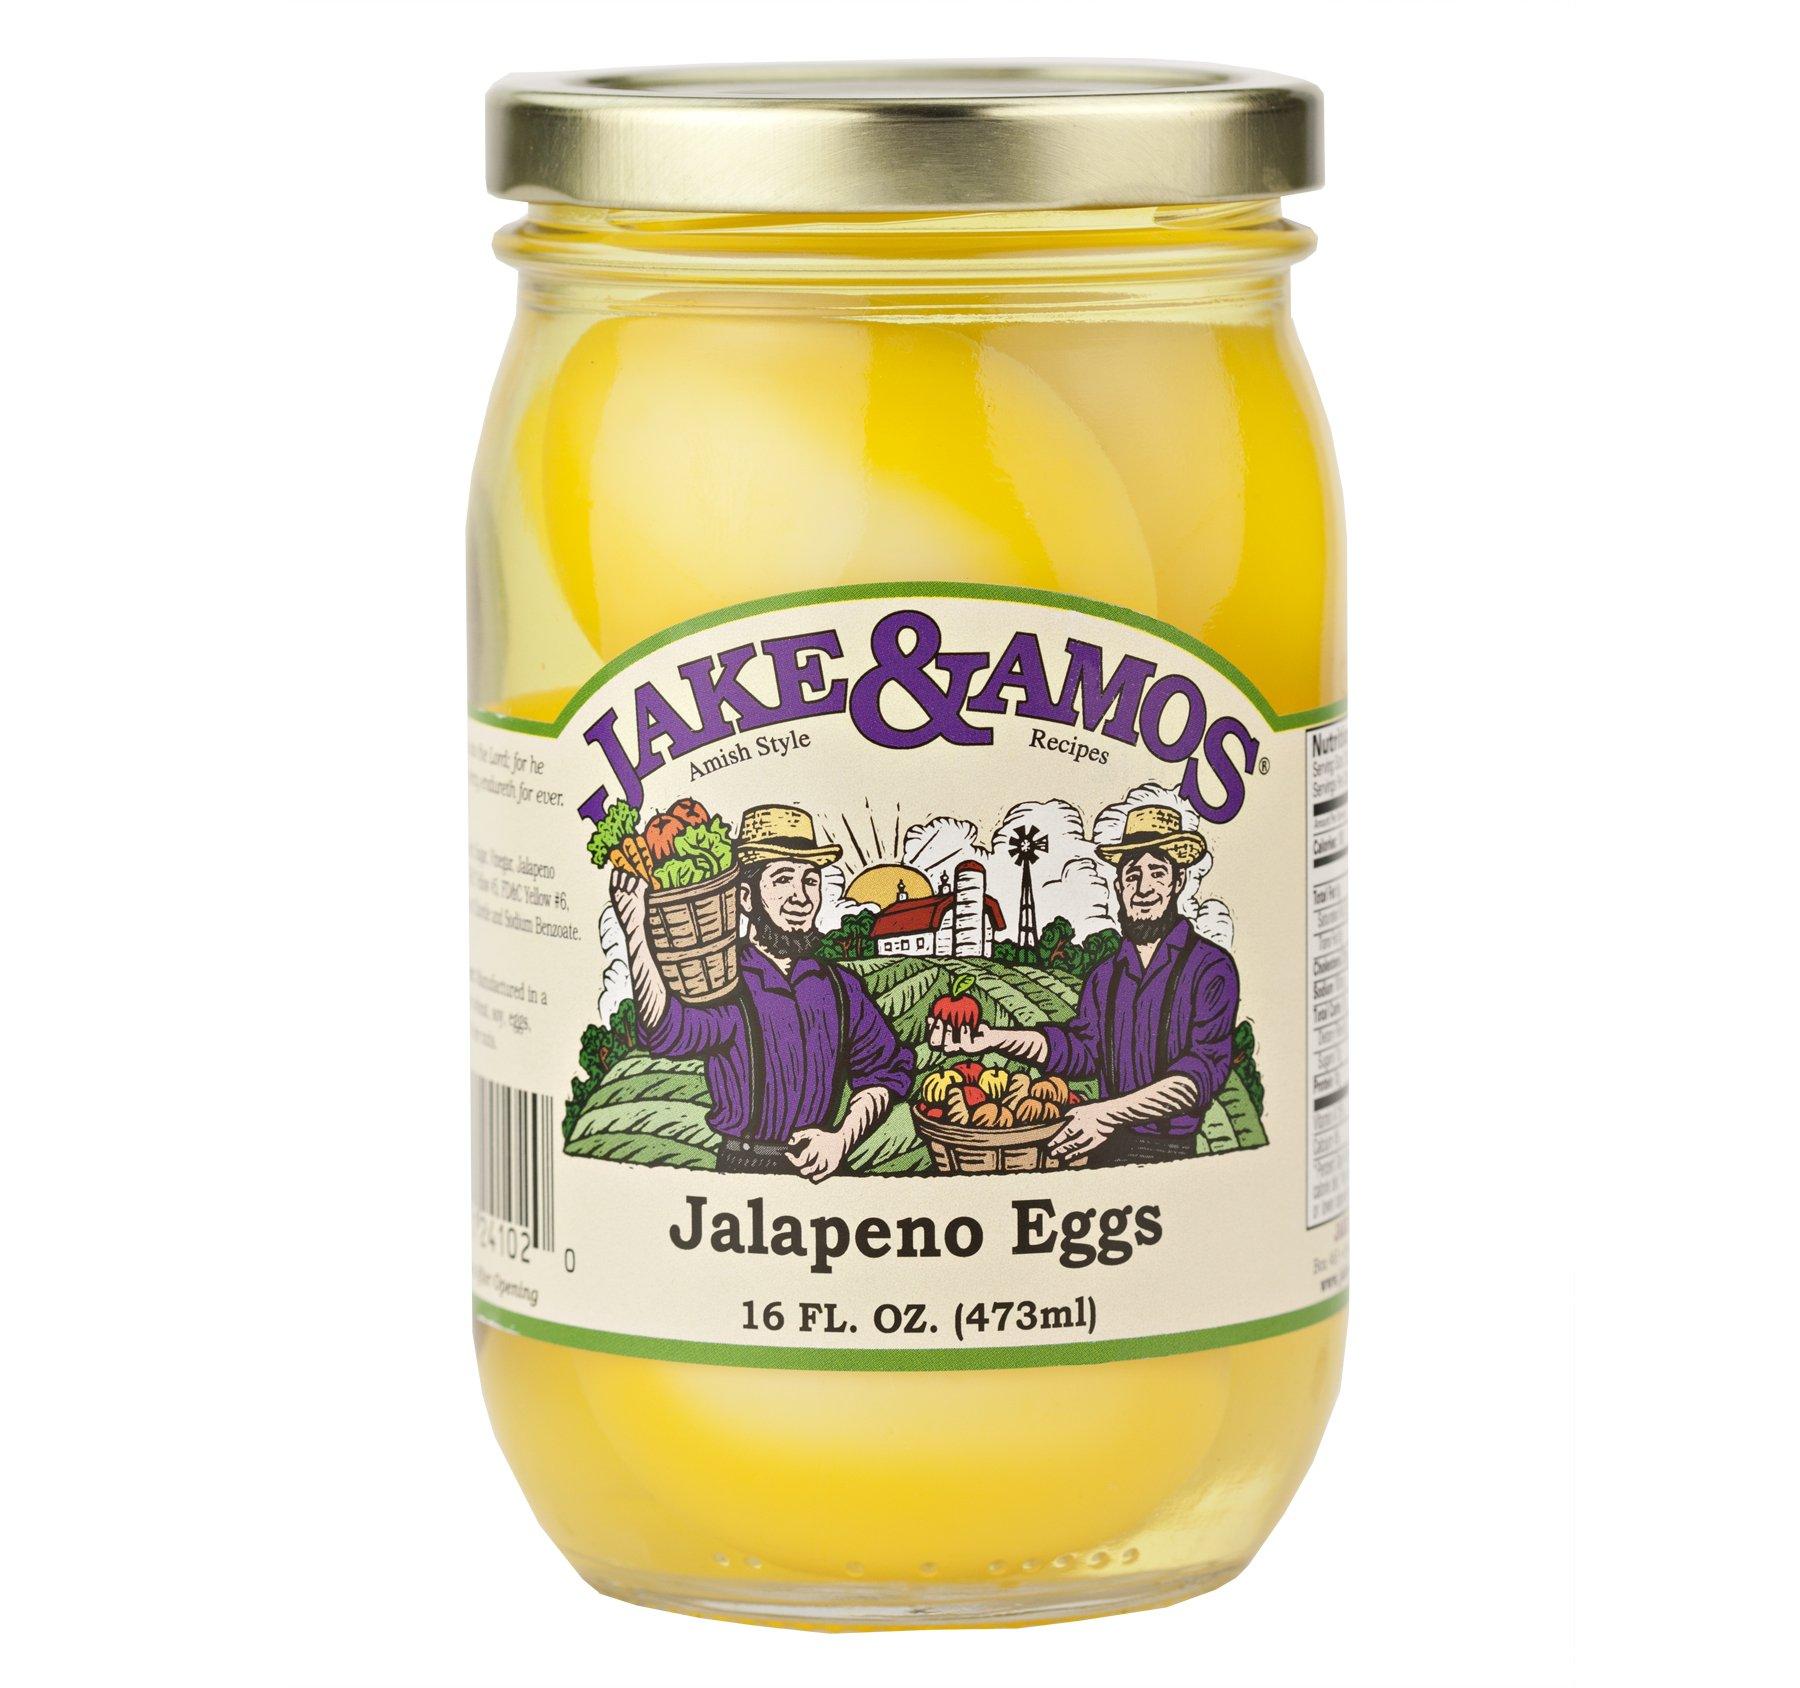 Jake & Amos Jalapeno Eggs 16 Oz. (3 Jars)